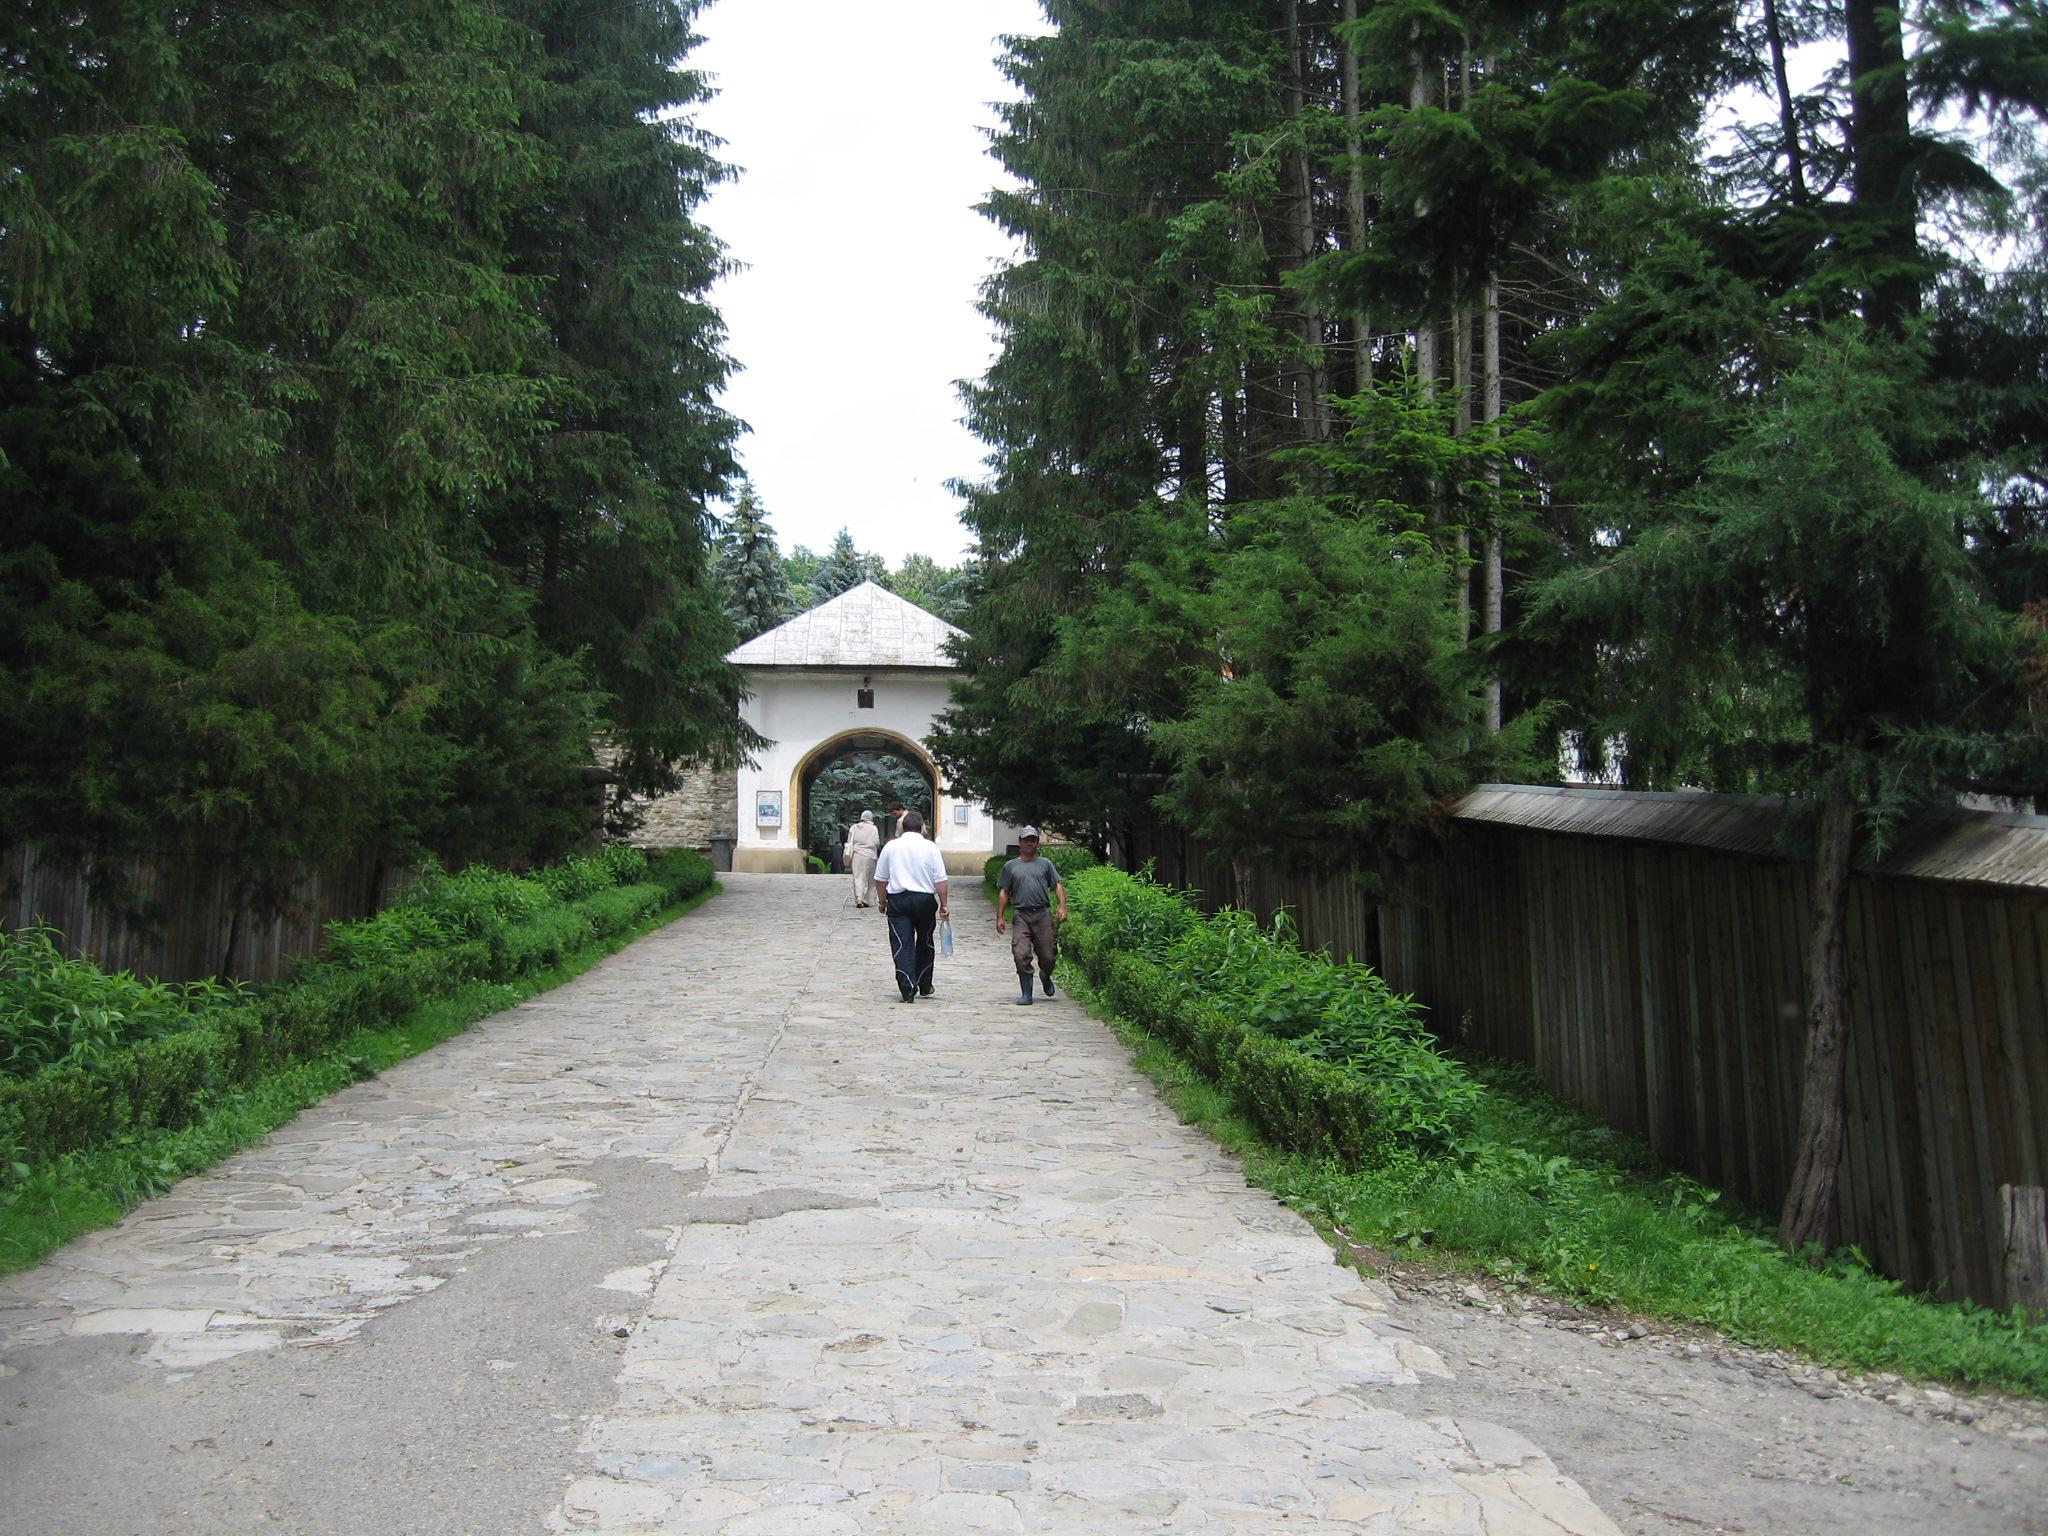 Fişier:Mănăstirea Sihăstria2.jpg